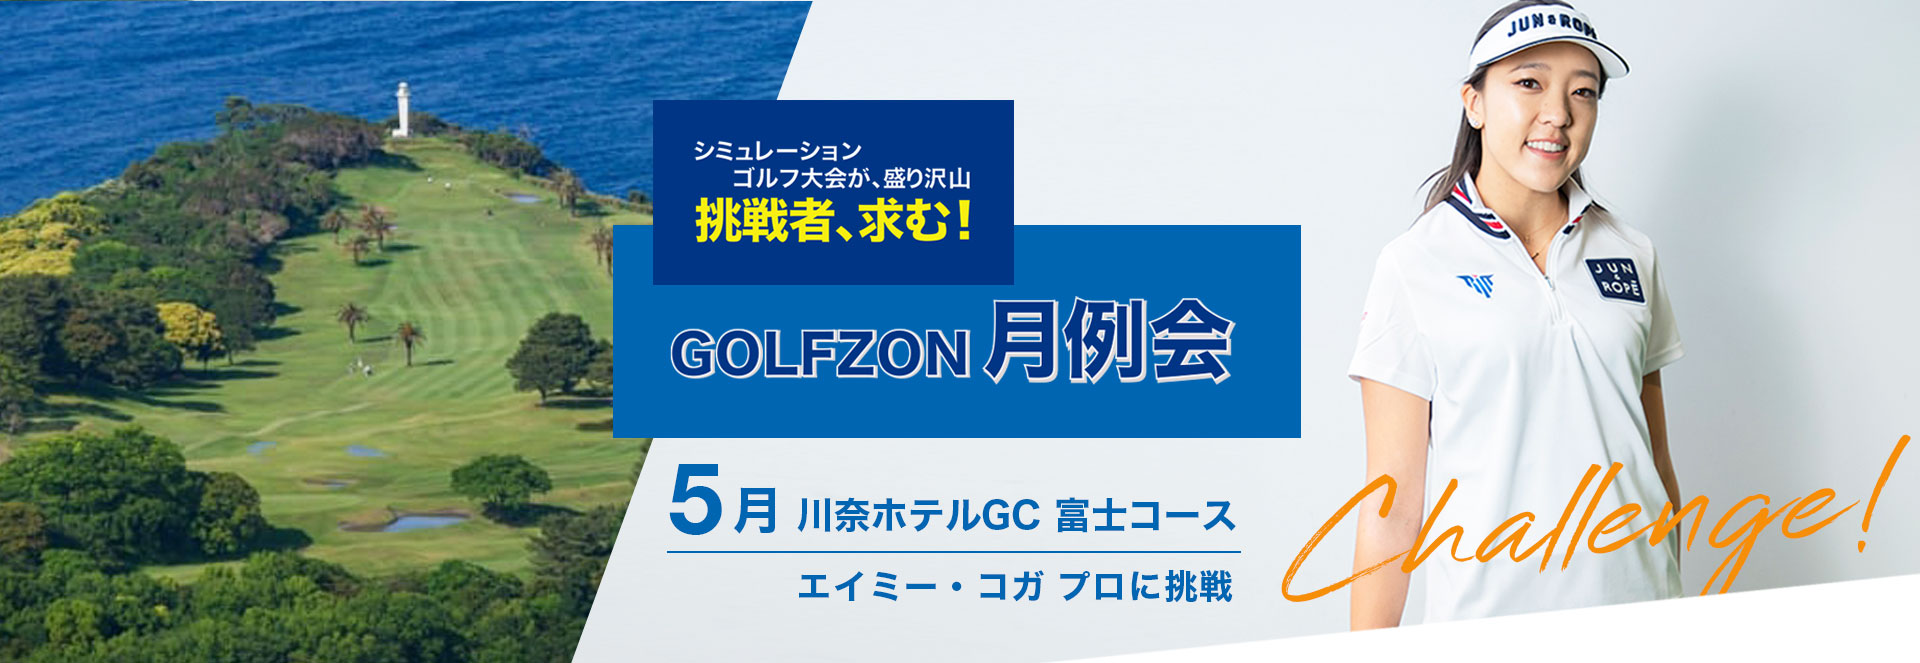 GOLFZON月例会/5月大会・結果